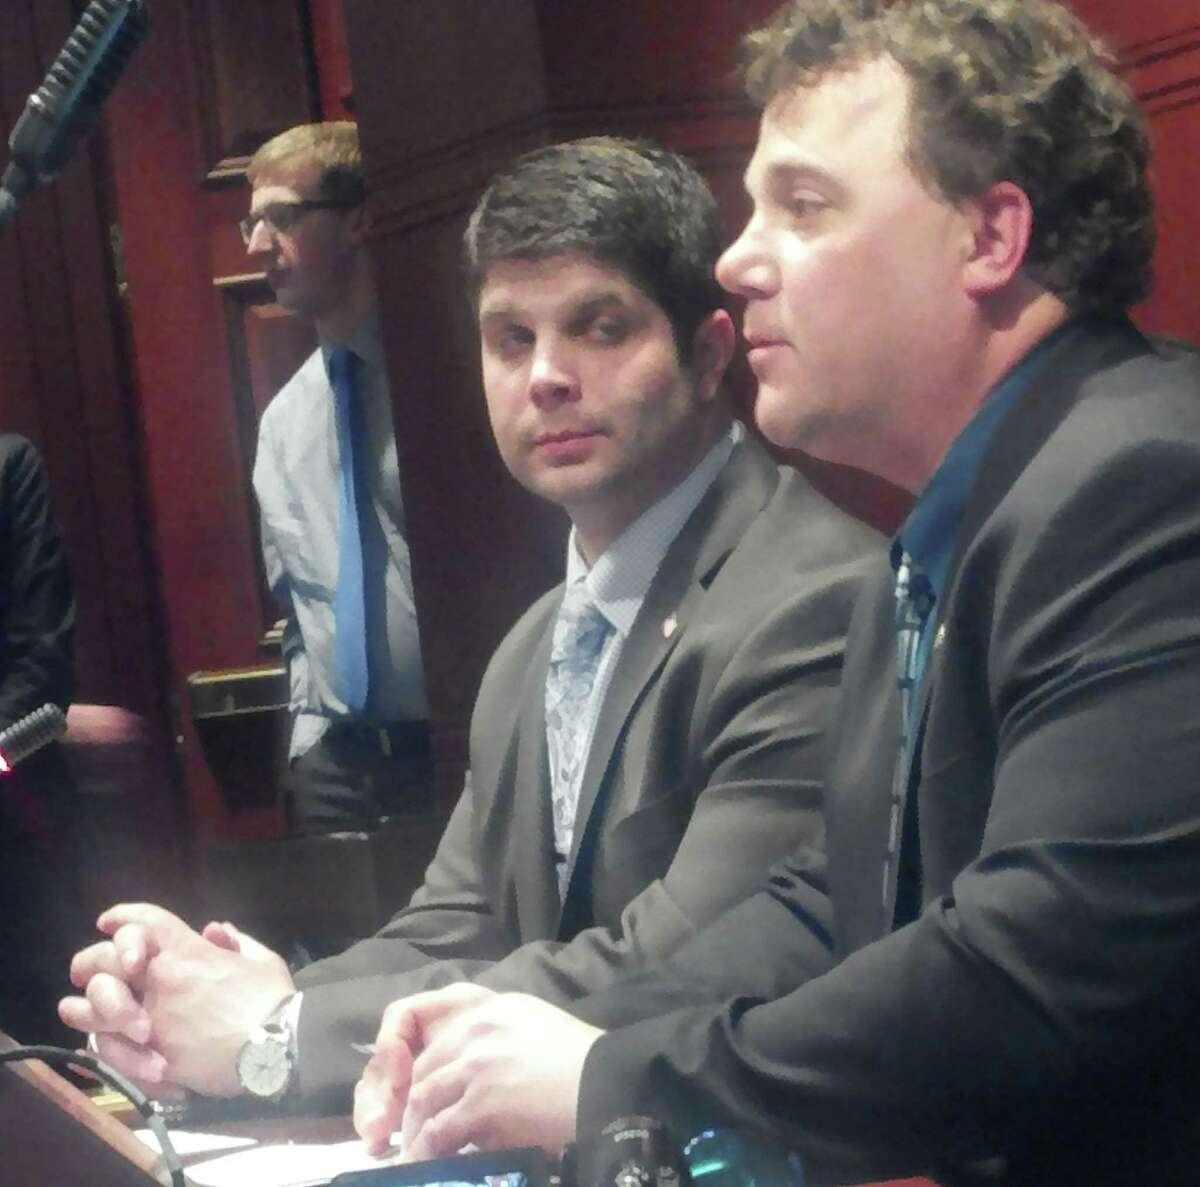 Middletown Mayor Dan Drew and Common Councilman Todd Berch in Hartford